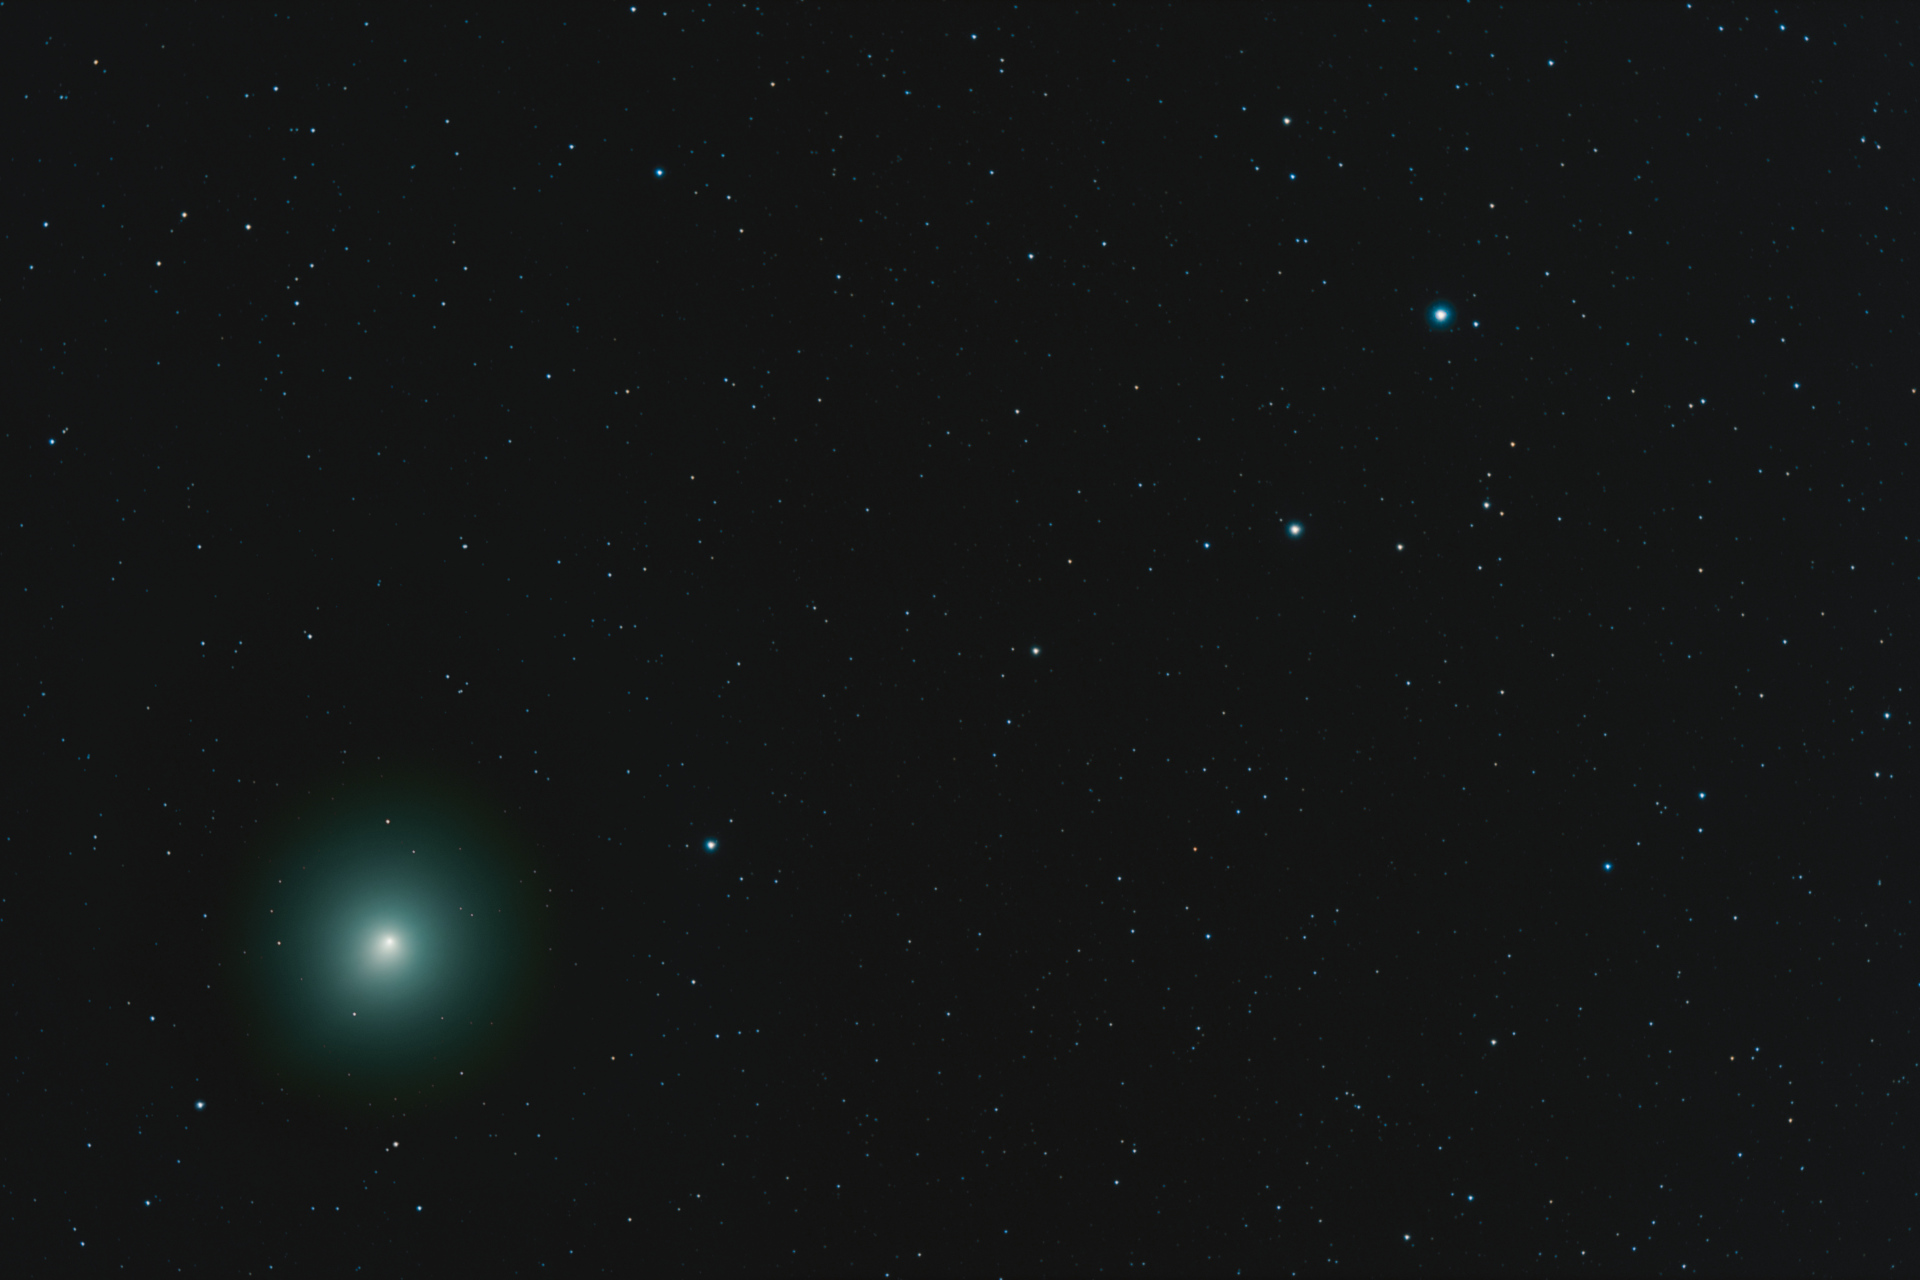 Comète 46P/Wirtanen 18121111